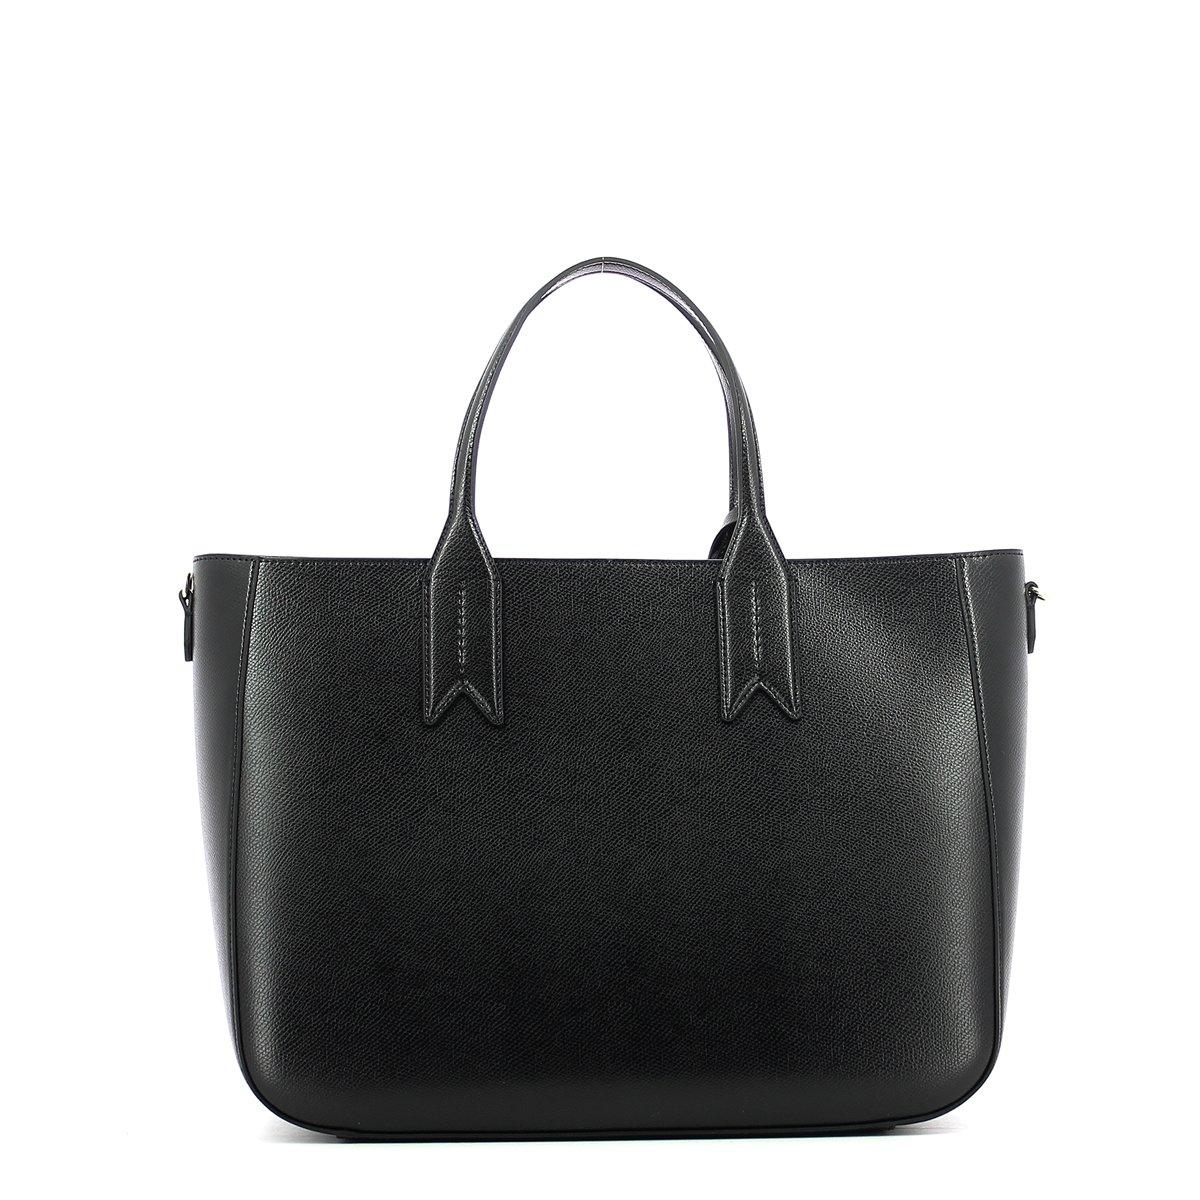 8992ca78fc97 Emporio Armani Frida Black Textured Tote Bag Black Leather  Amazon.co.uk   Shoes   Bags